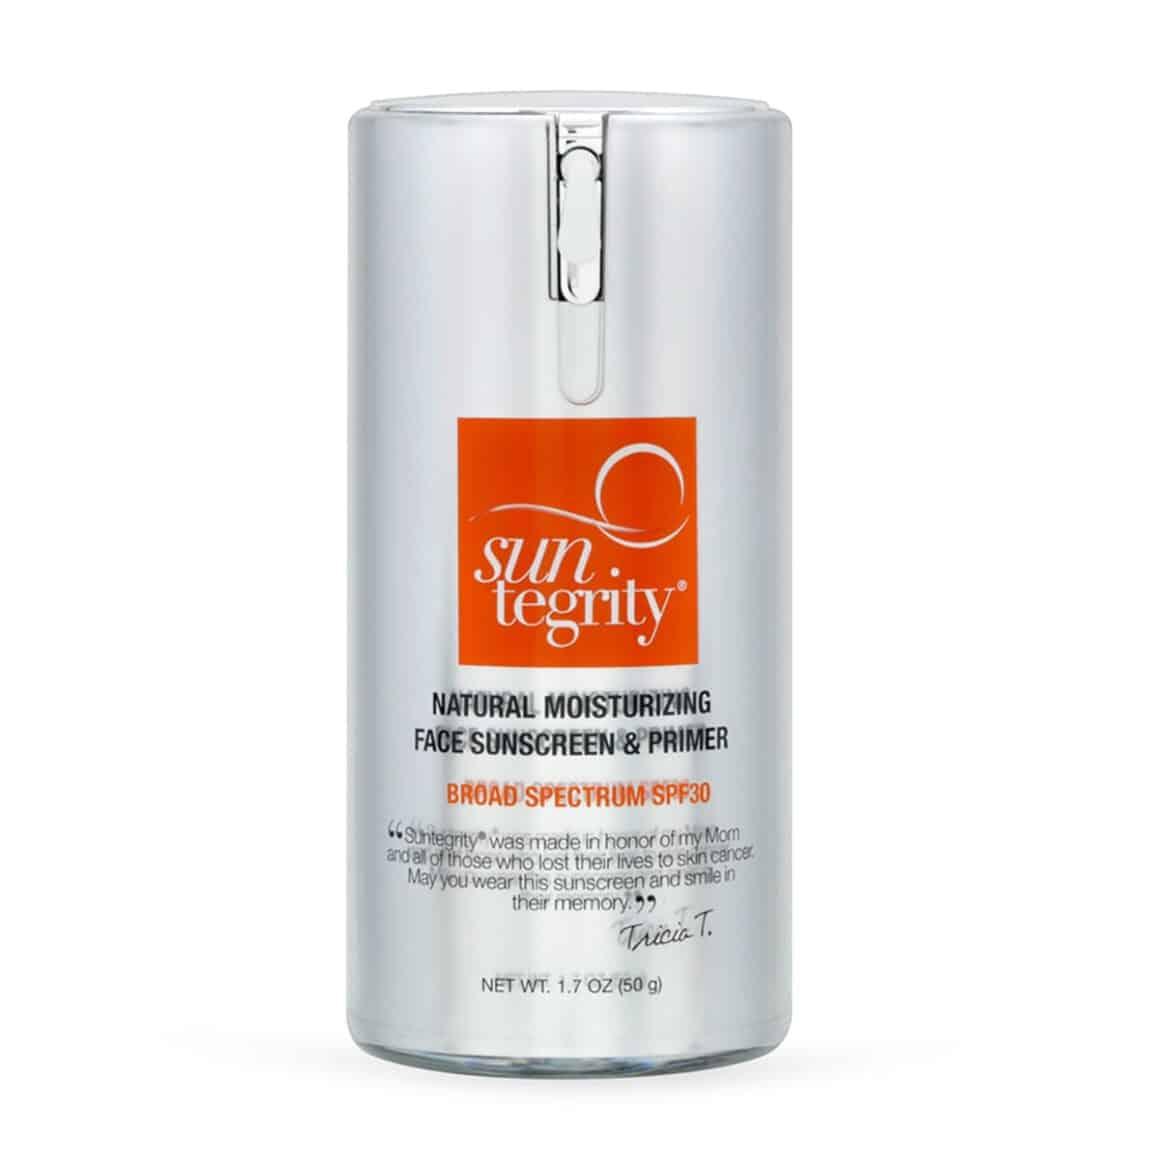 Suntegrity Natural Moisturizing Face Sunscreen & Primer SPF30 broad spectrum, mineral sunscreen, 20% non-nano zinc oxide